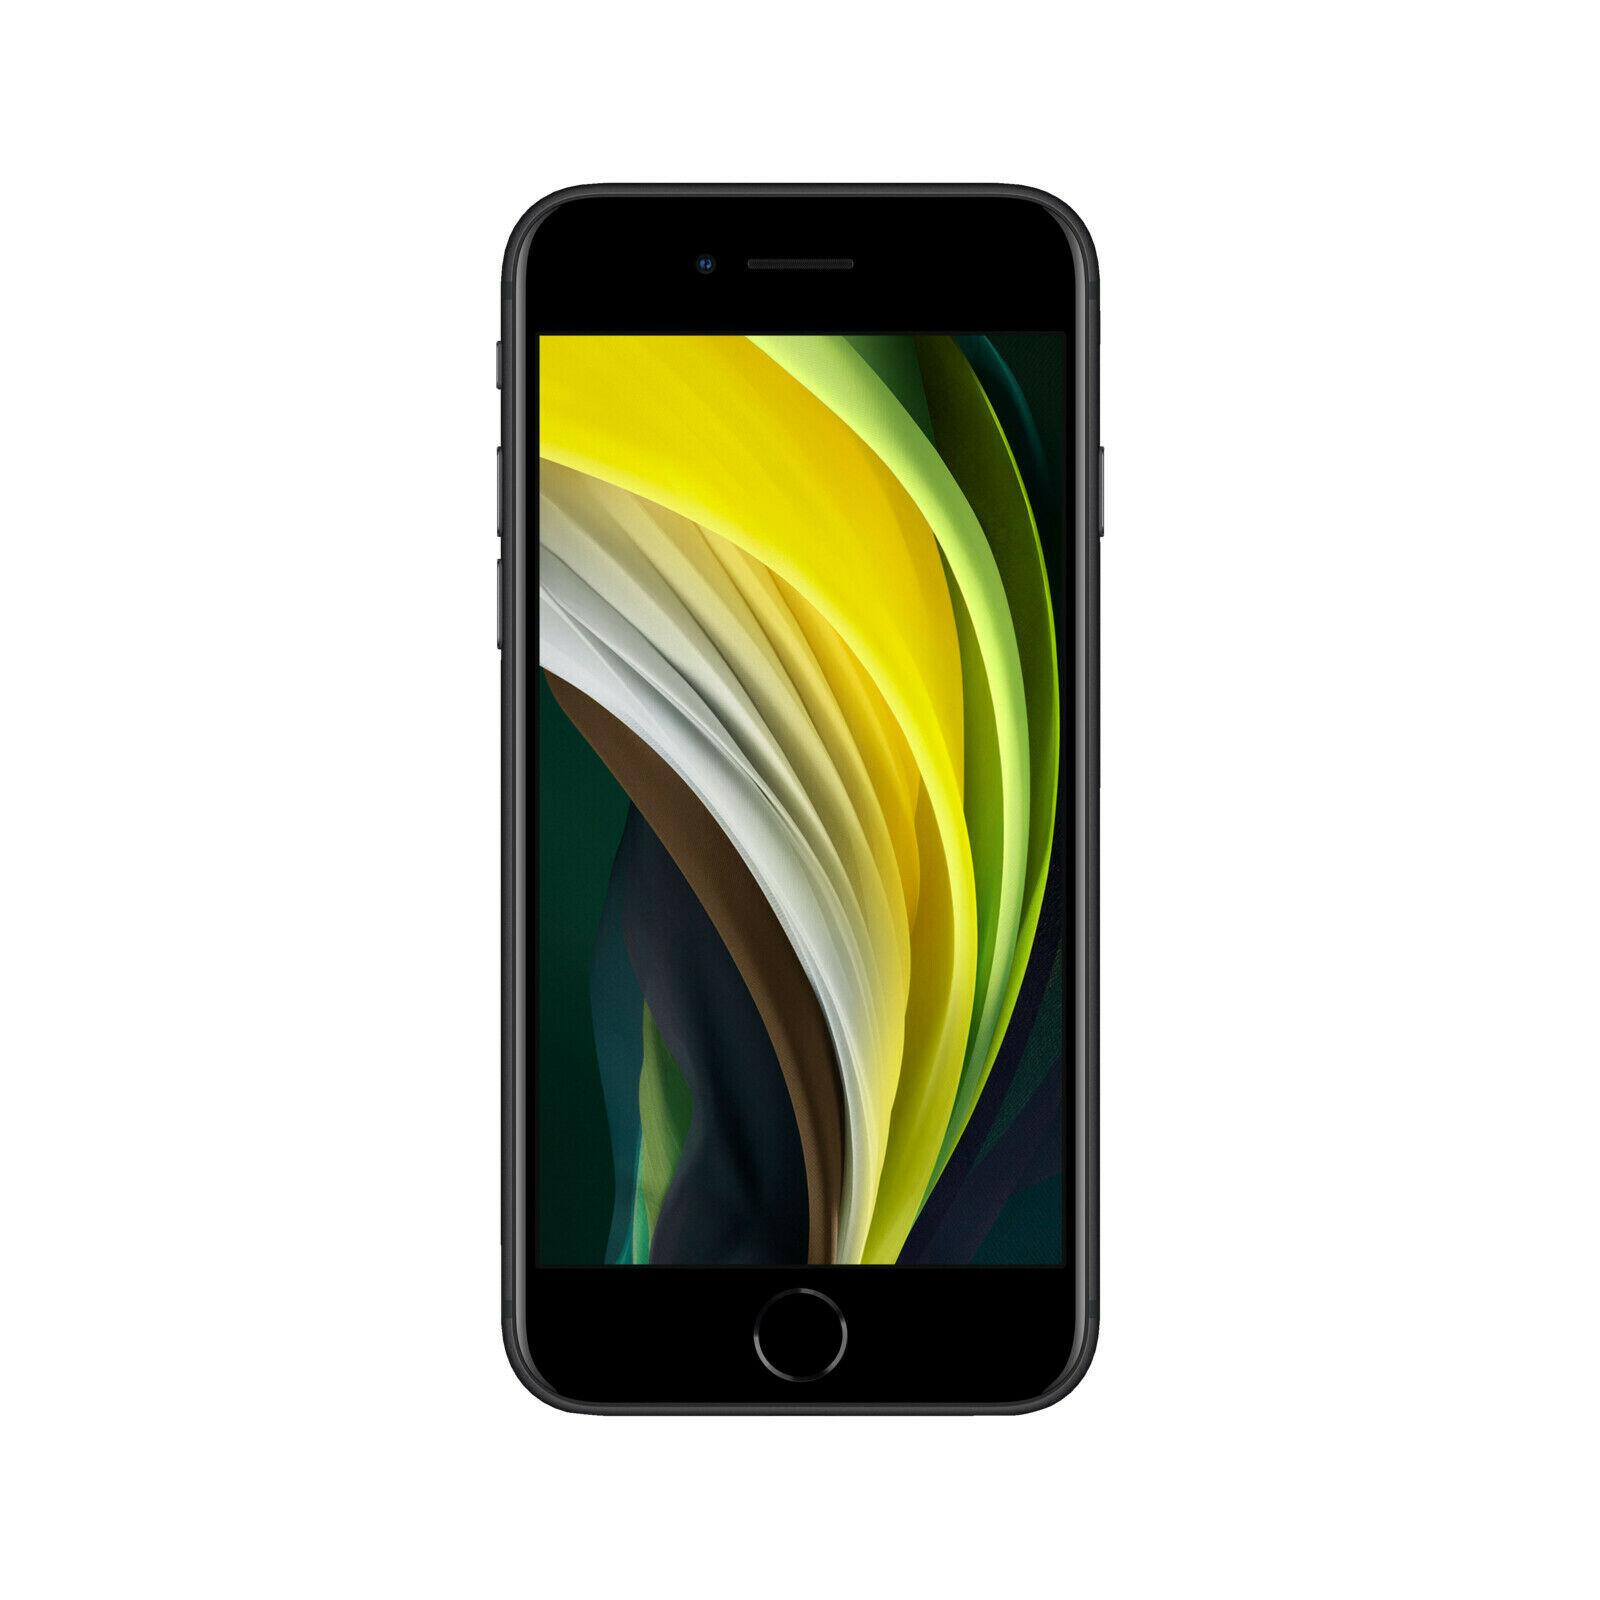 Apple iPhone SE 256 GB (Schwarz) [eBay Saturn]